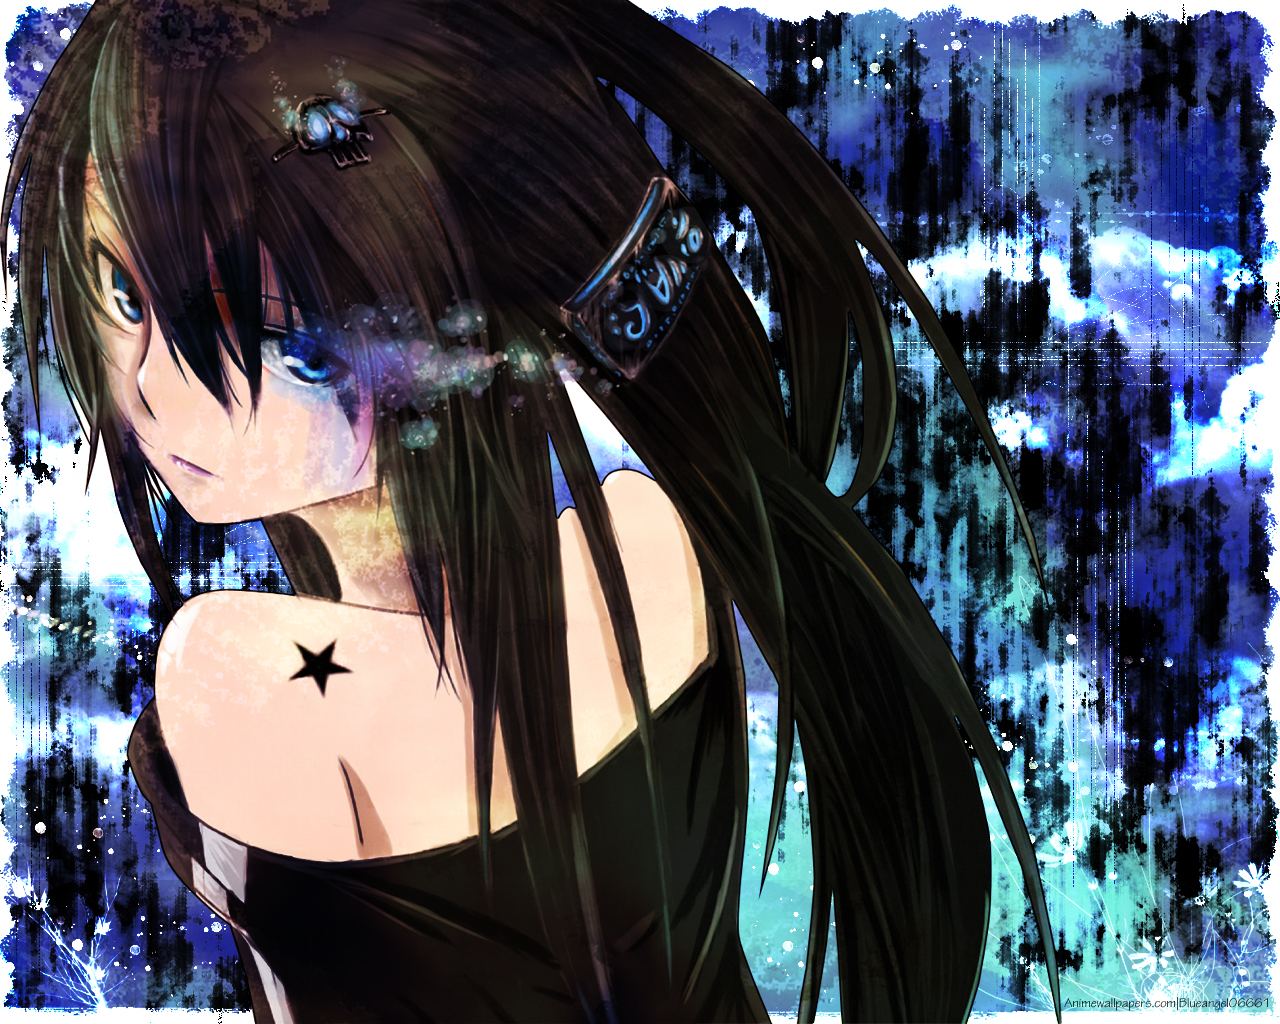 Miscellaneous Anime Wallpaper # 149